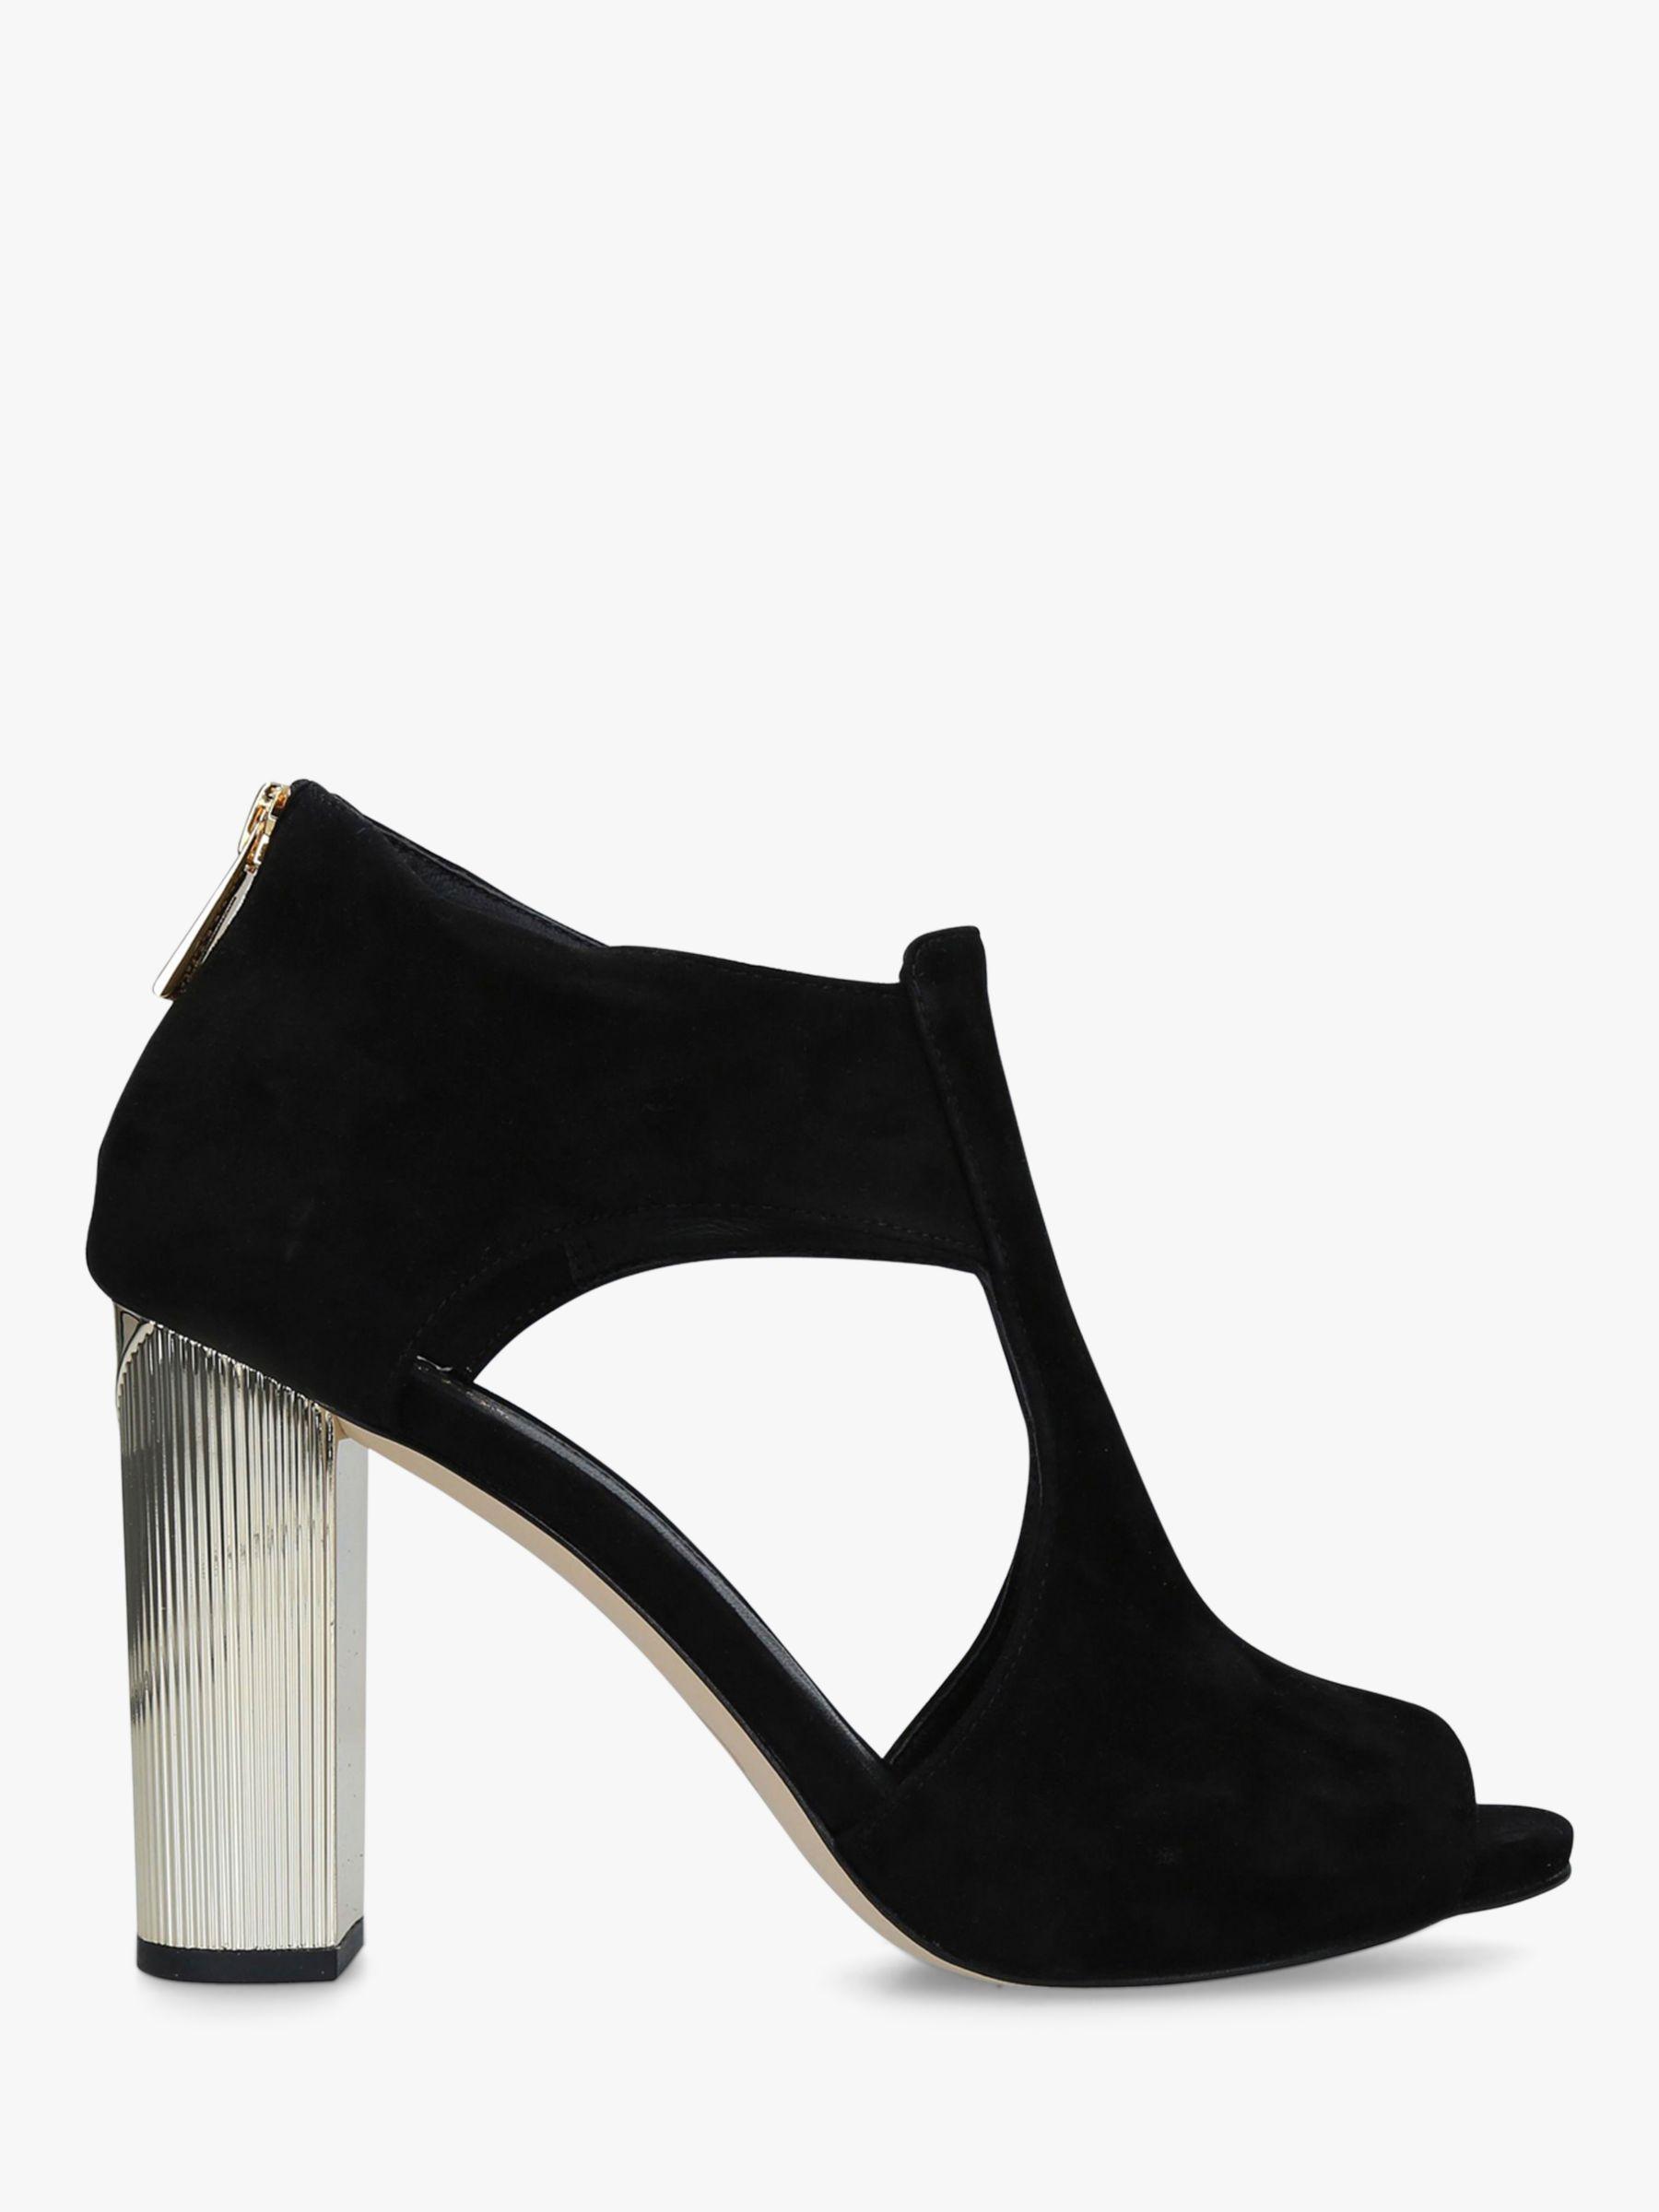 ladies black and white peep toe shoes